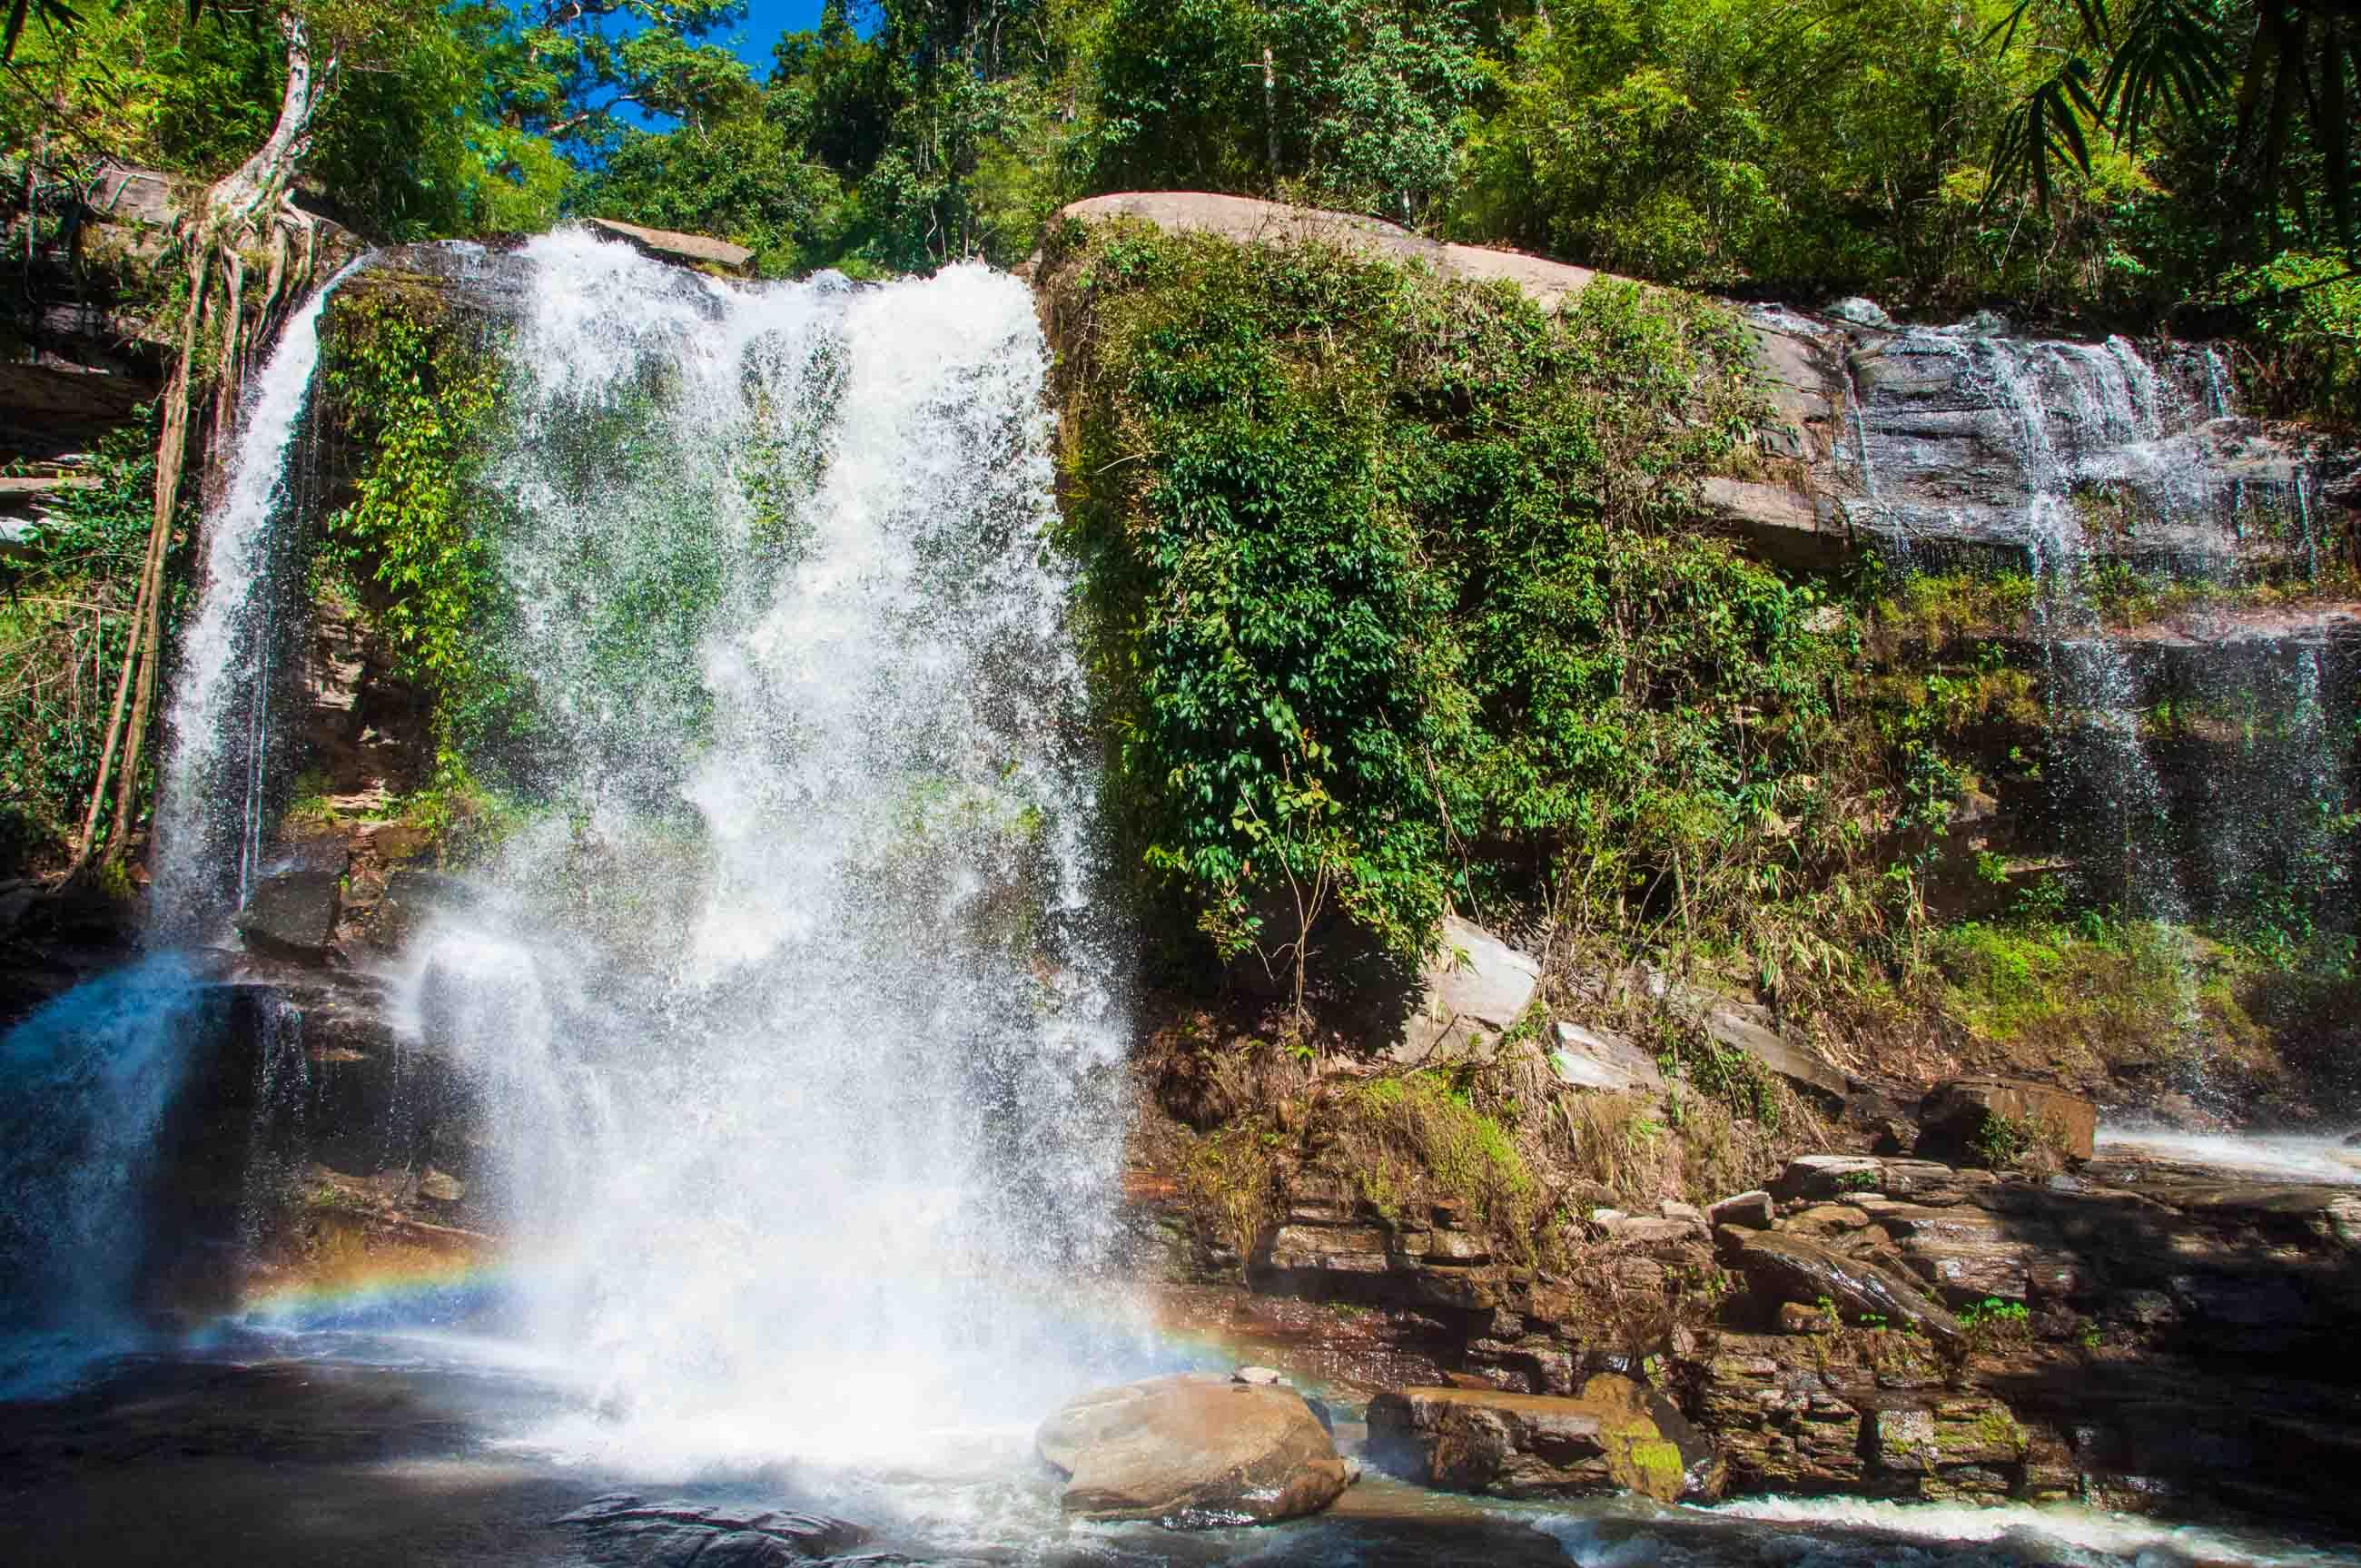 https://bubo.sk/uploads/galleries/5063/tomaskubus_thajsko_tms_chiang-mai_vodopady-pri-treku.jpg